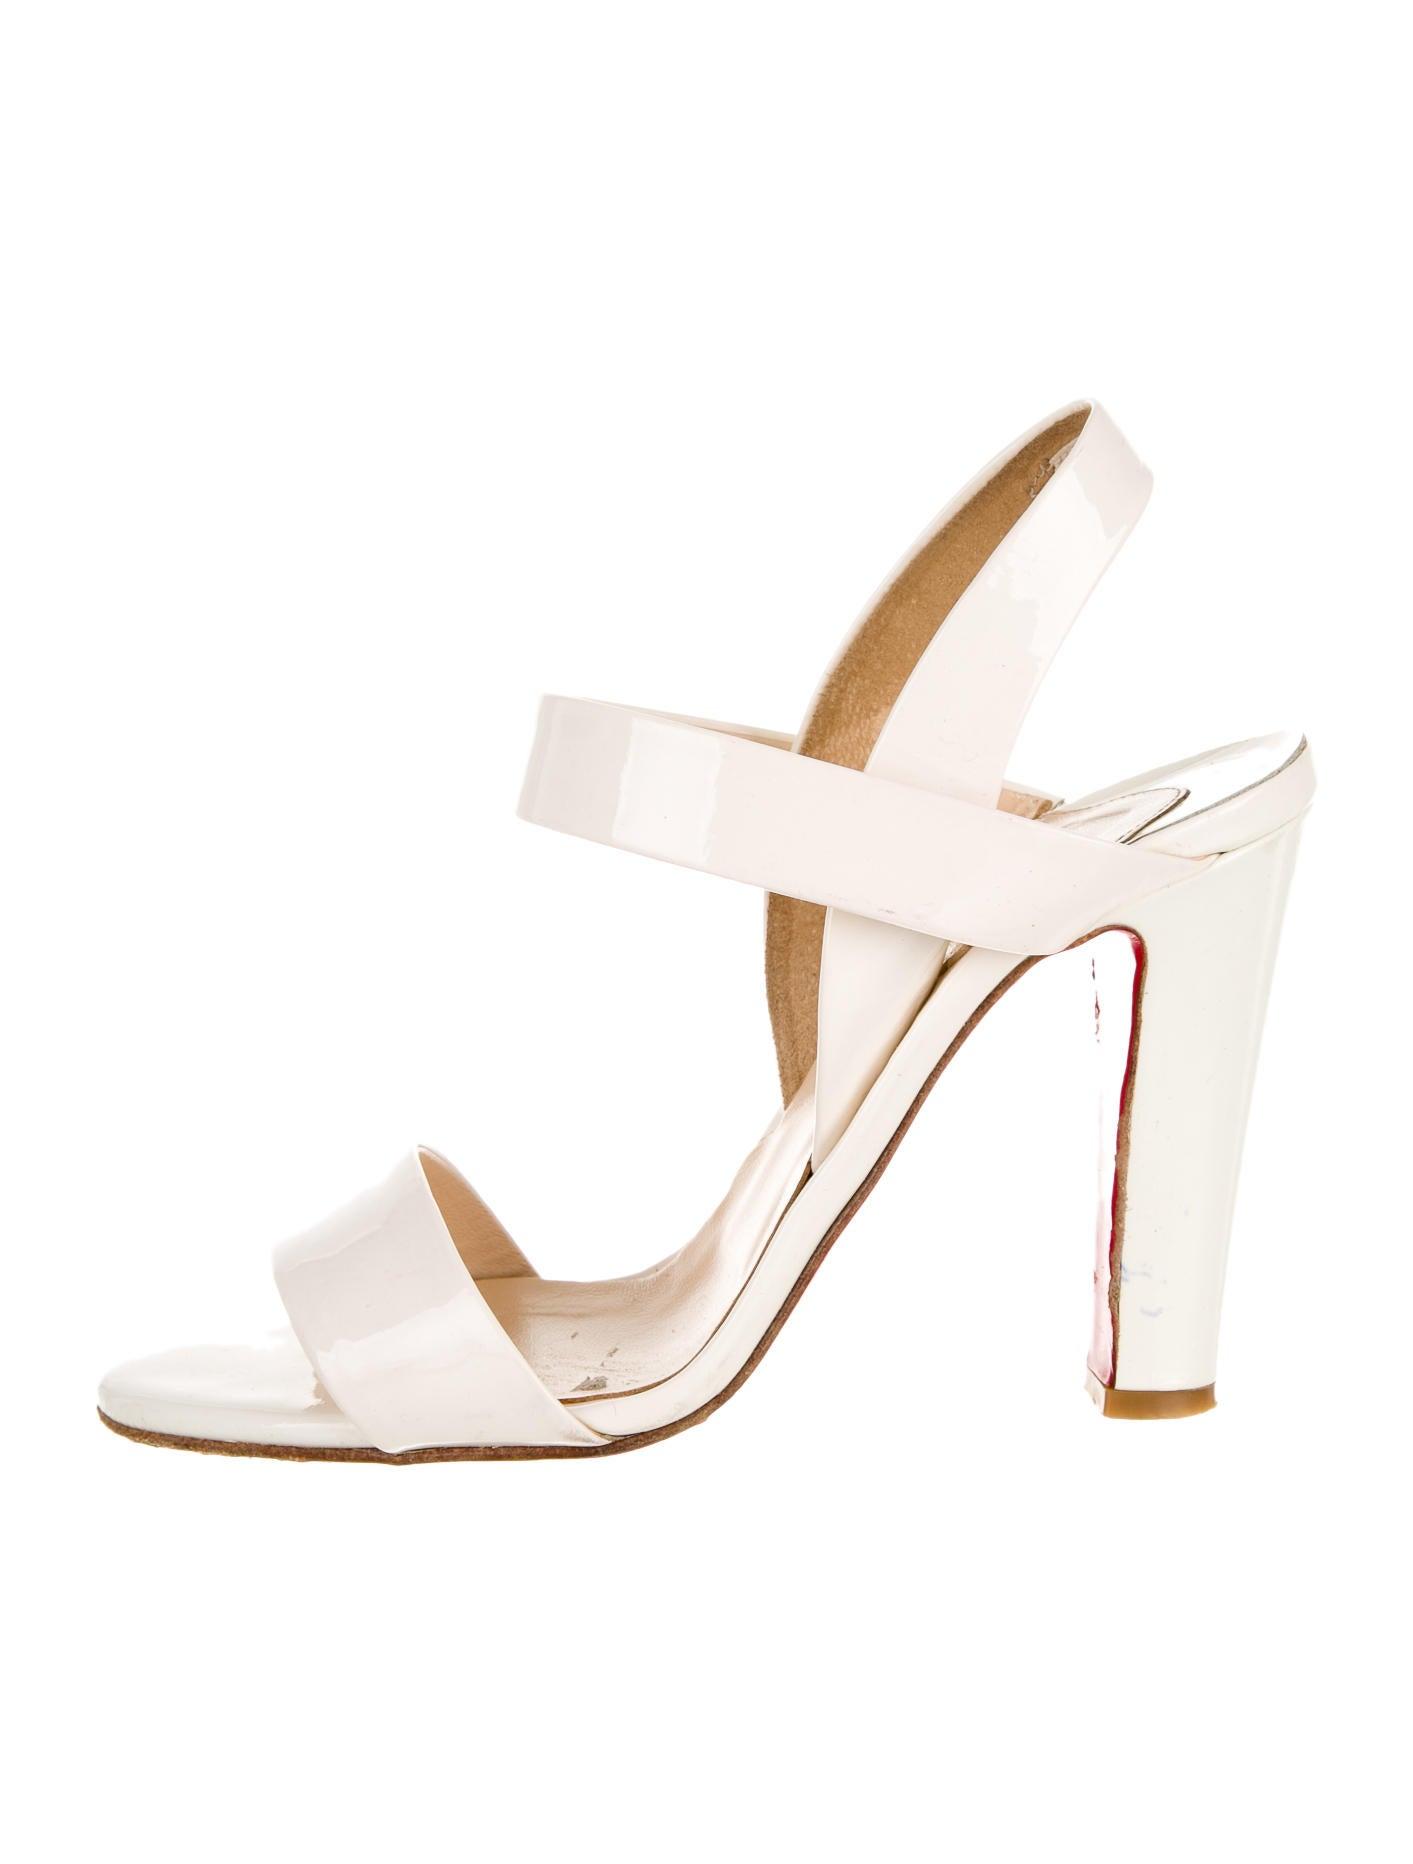 louboutin heeled sandals